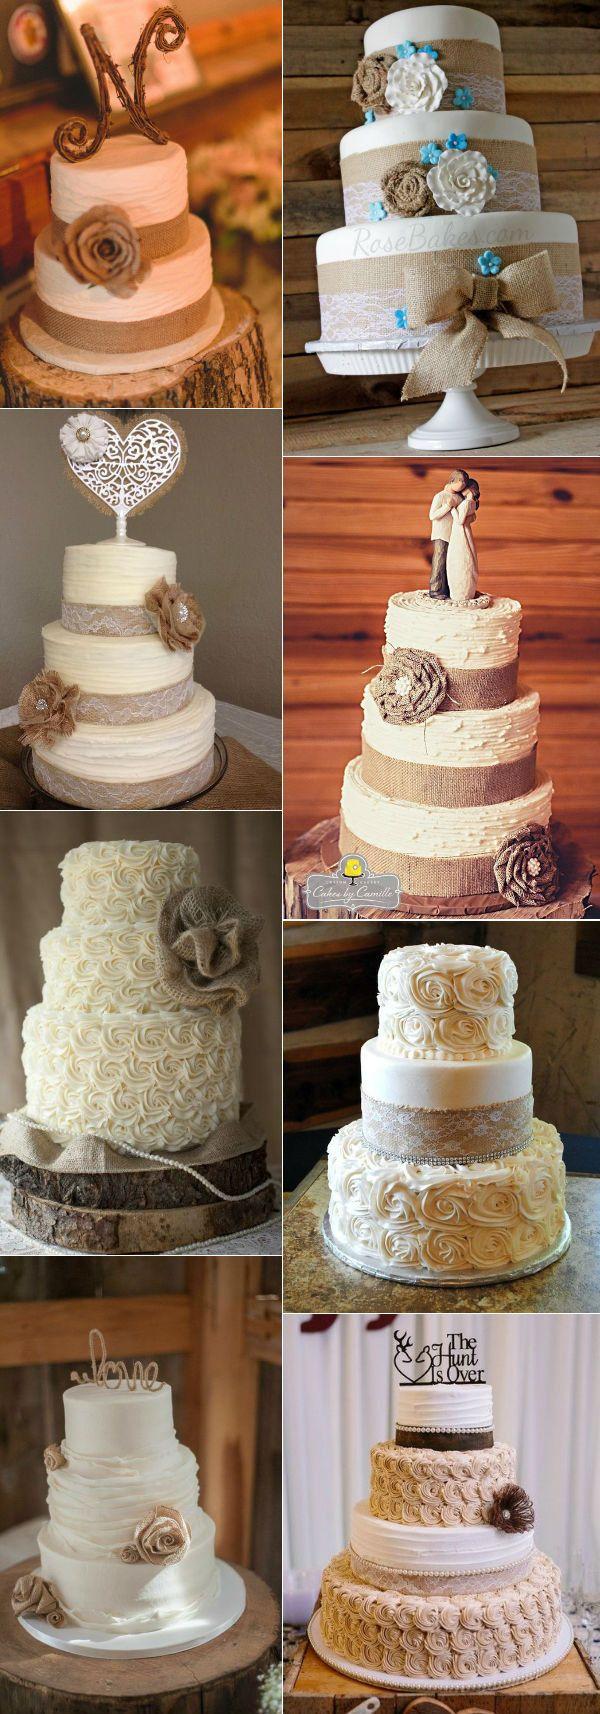 32 Amazing Wedding Cakes Perfect For Fall Elegantweddinginvites Com Blog Wedding Cake Rustic Country Wedding Cakes Wedding Cake Rustic Country